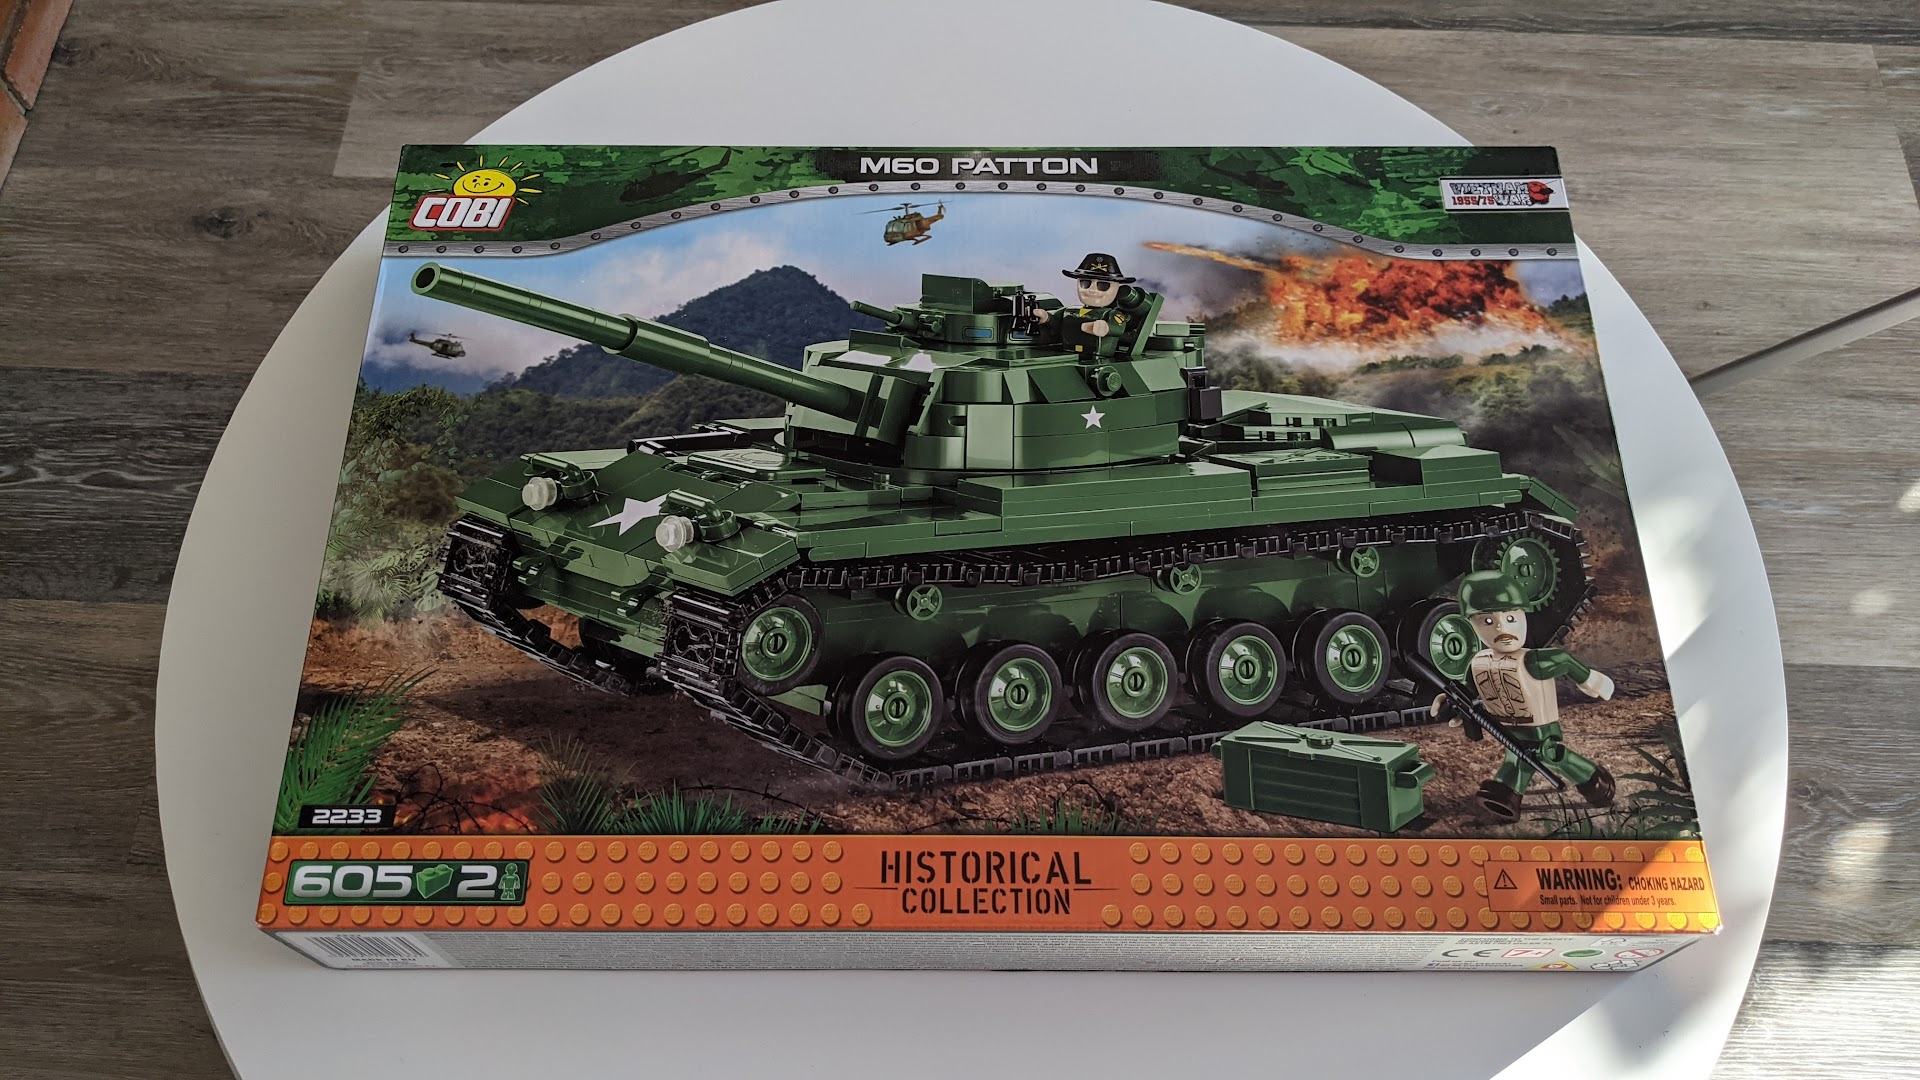 The COBI M60 Patton Box